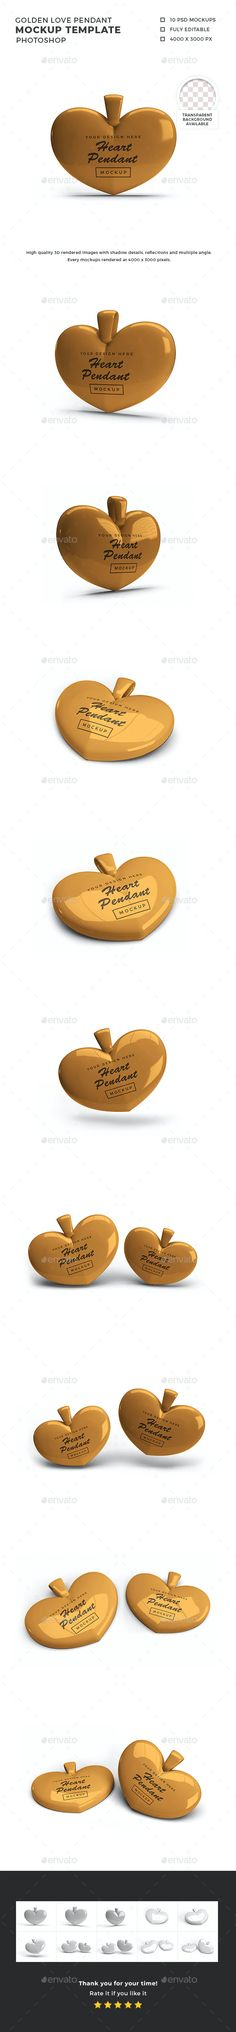 Golden Love Pendant Mockup Template by DendySign | GraphicRiver